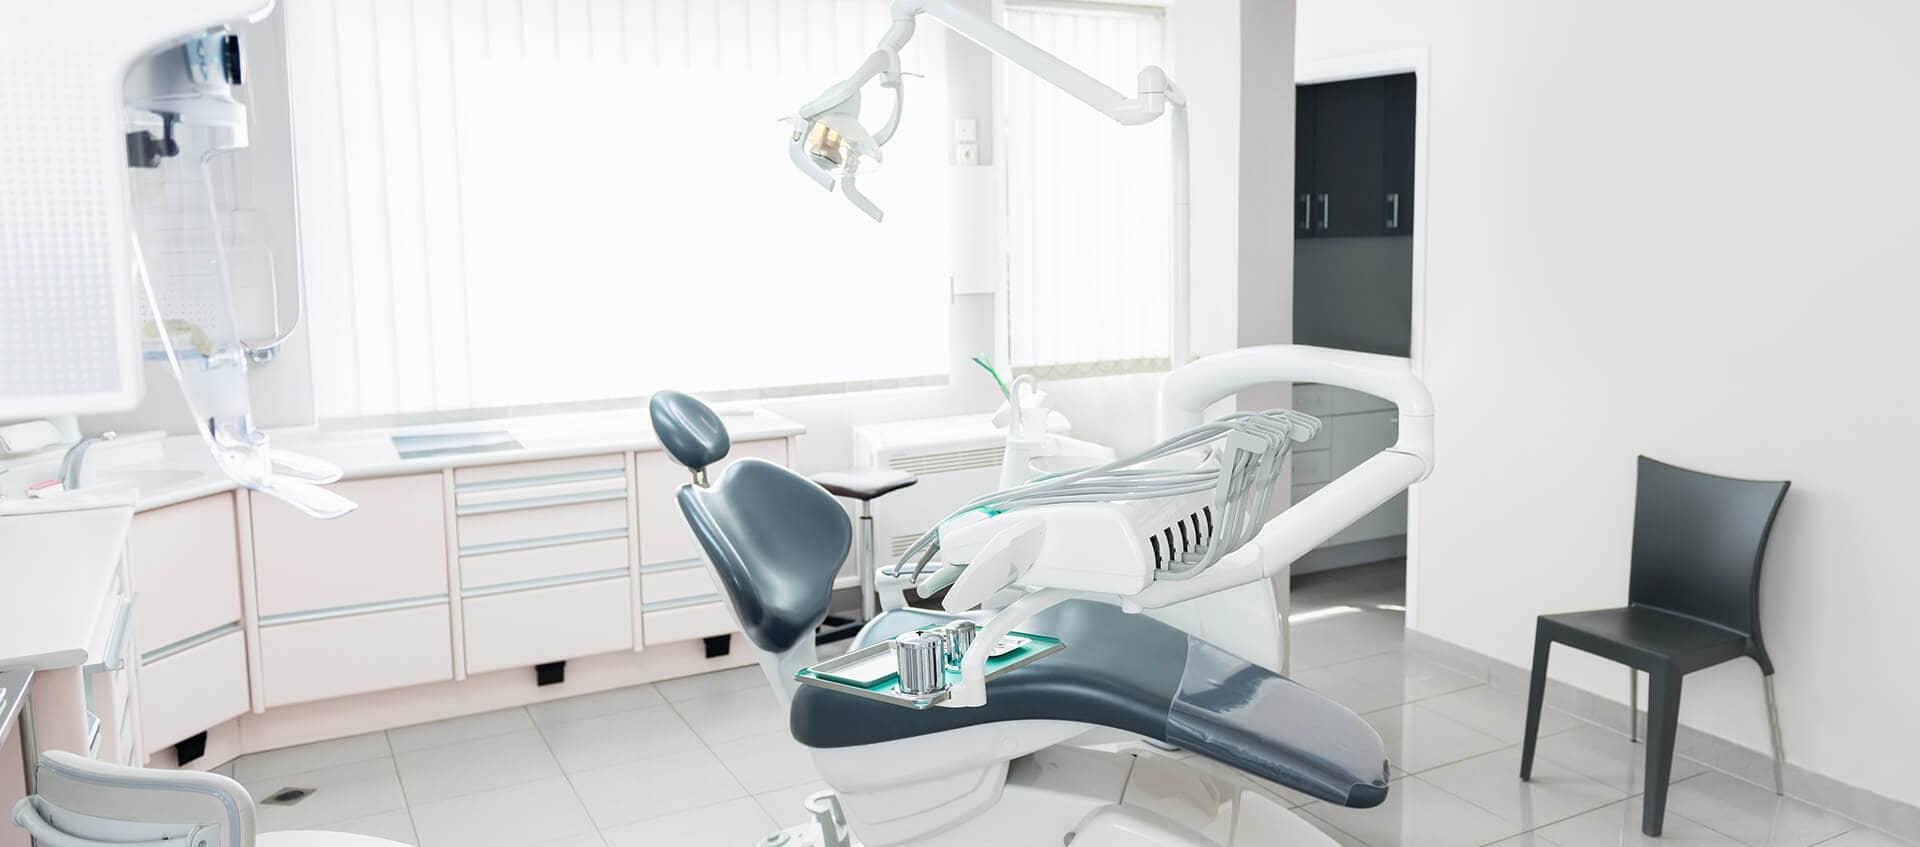 Mr Rright Dental Chair